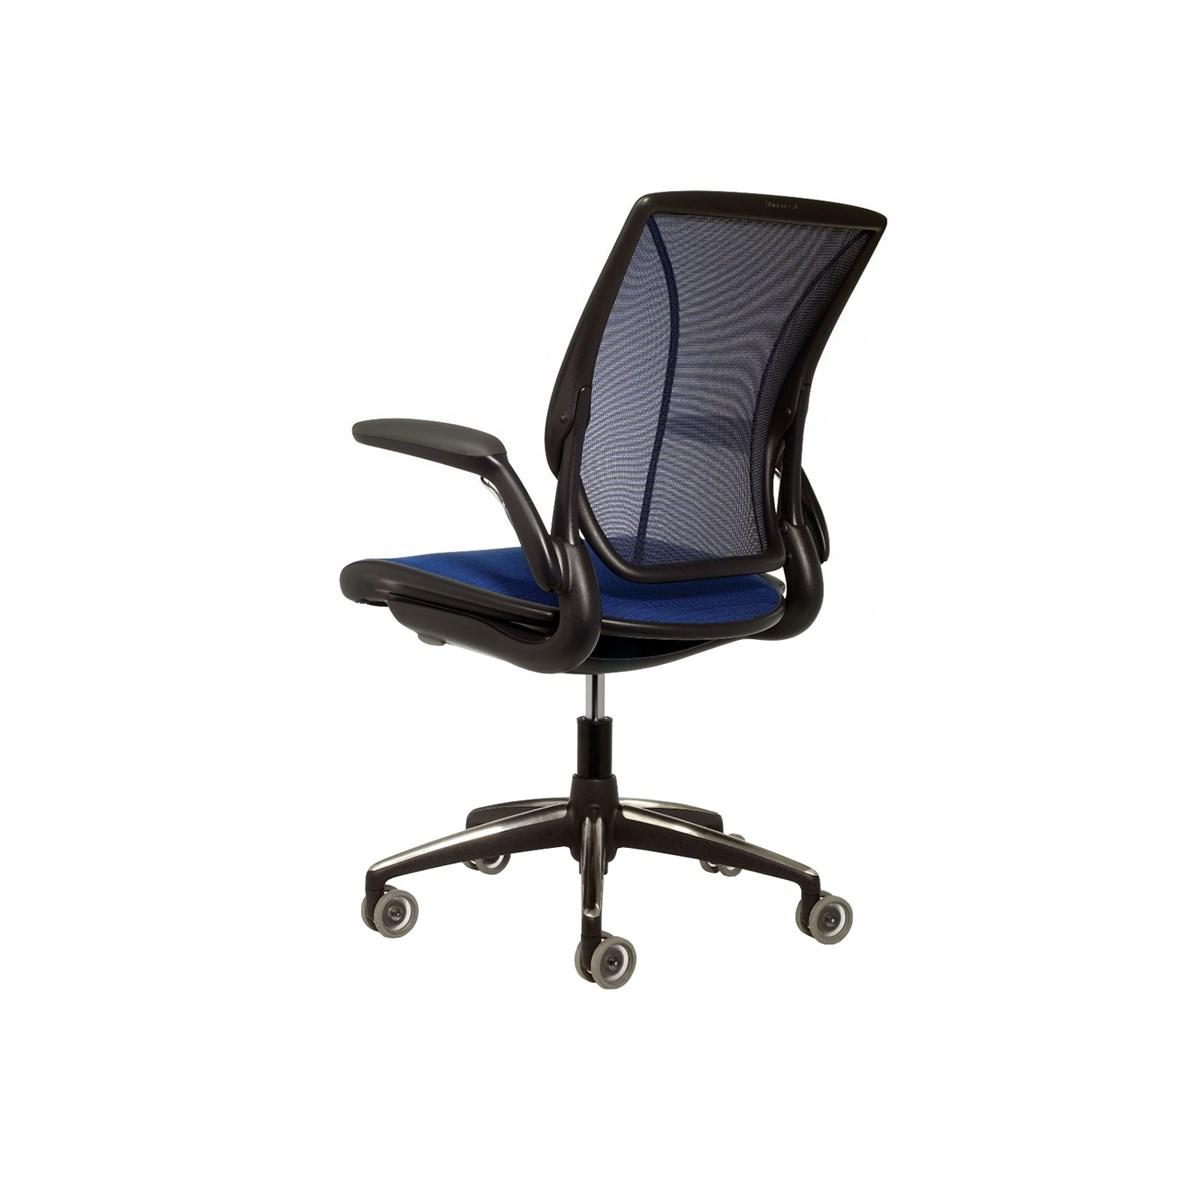 Humanscale-Niels-Diffrient-World-Task-Chair-Matisse-2